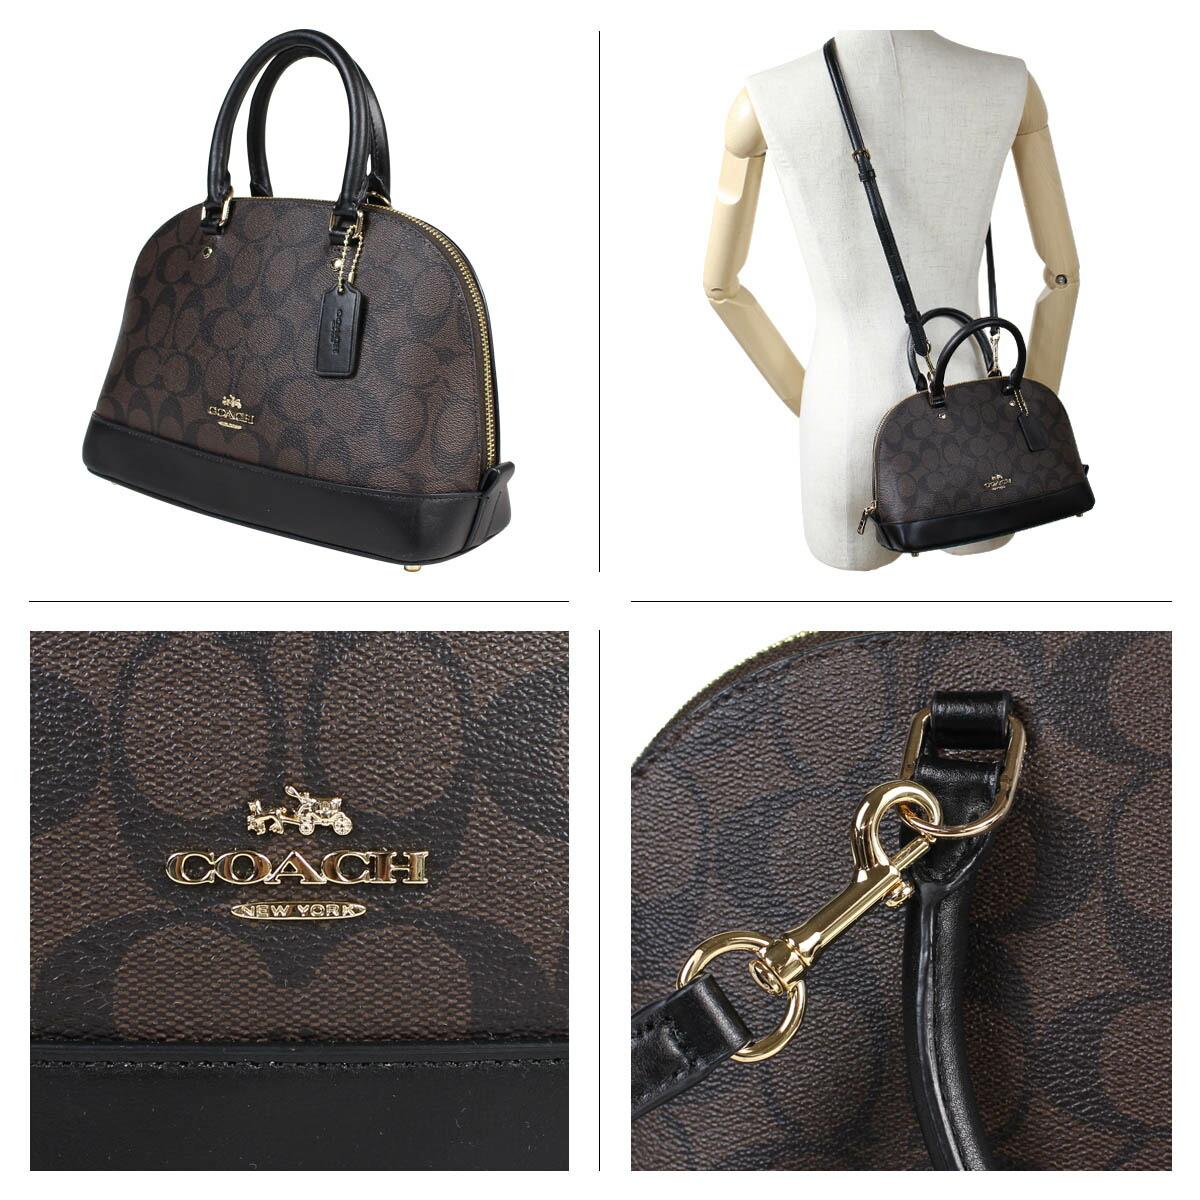 ba5e80a2e ... COACH coach bag shoulder bag Lady's MINI SIERRA SATCHEL IN SIGNATURE  COATED CANVAS F59295 brown ...